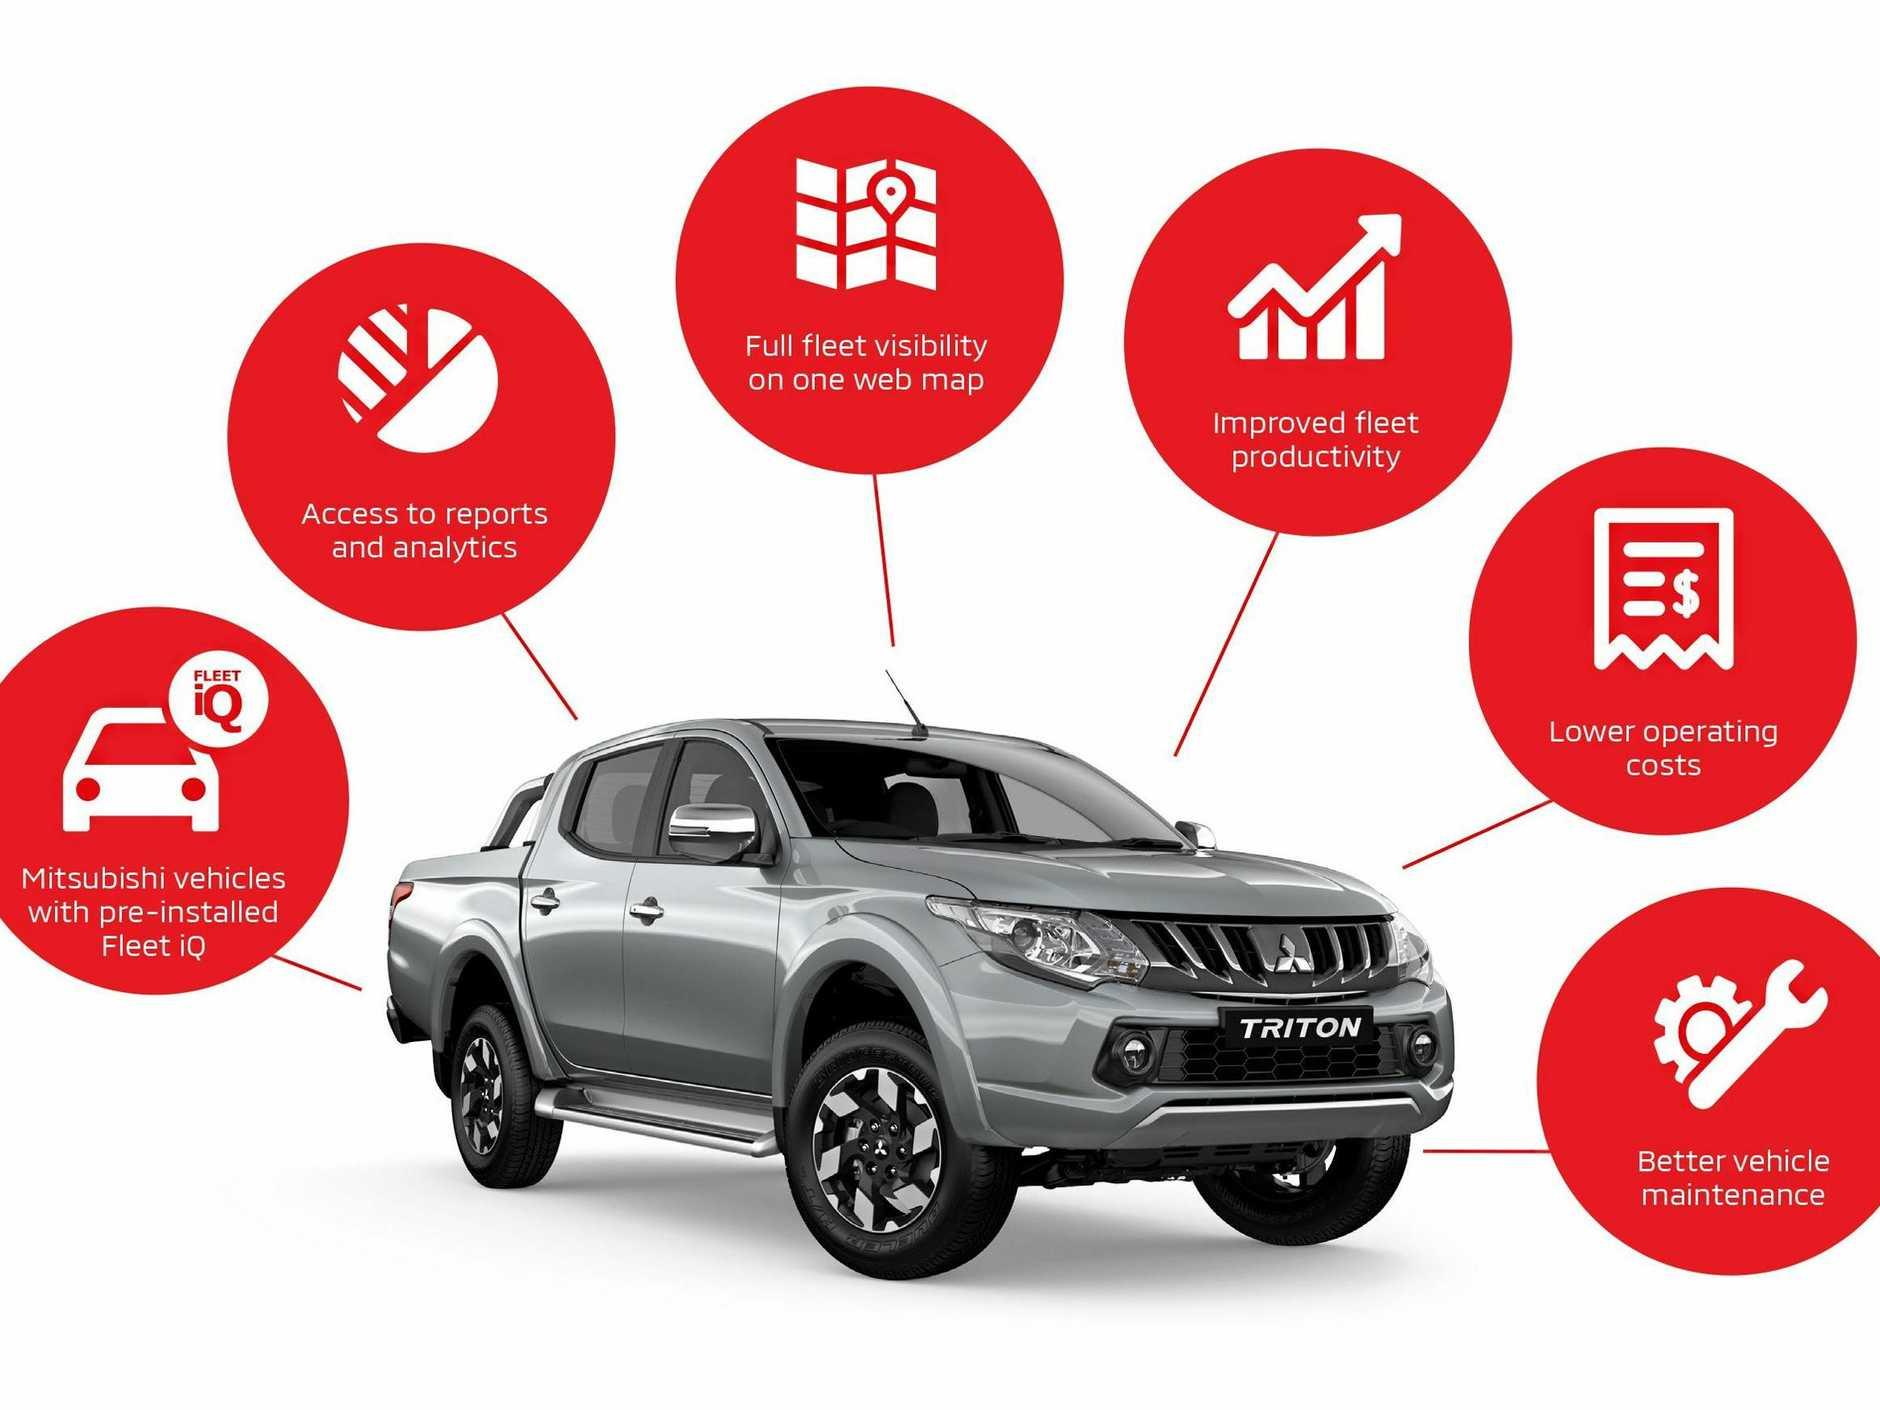 Mitsubishi has launched Mitsubishi Motors Fleet iQ, a system provide constant analysis of fleet vehicles.